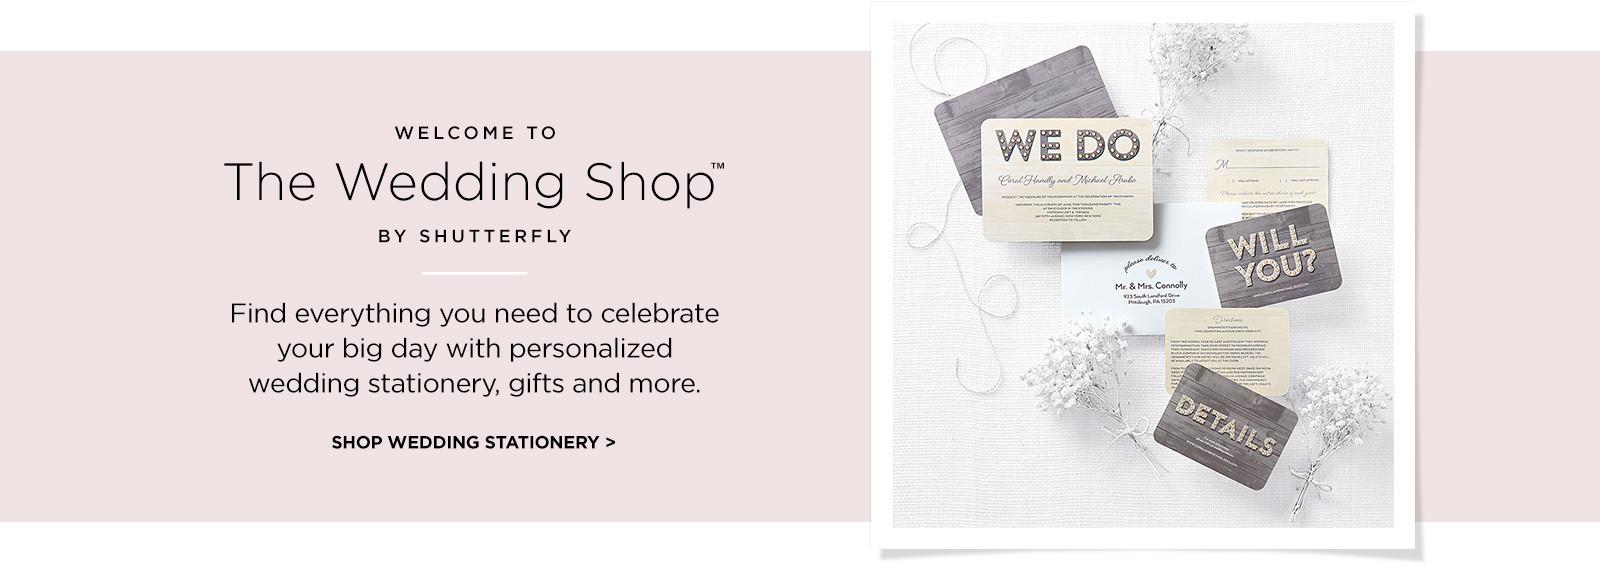 The Wedding Shop | Shutterfly